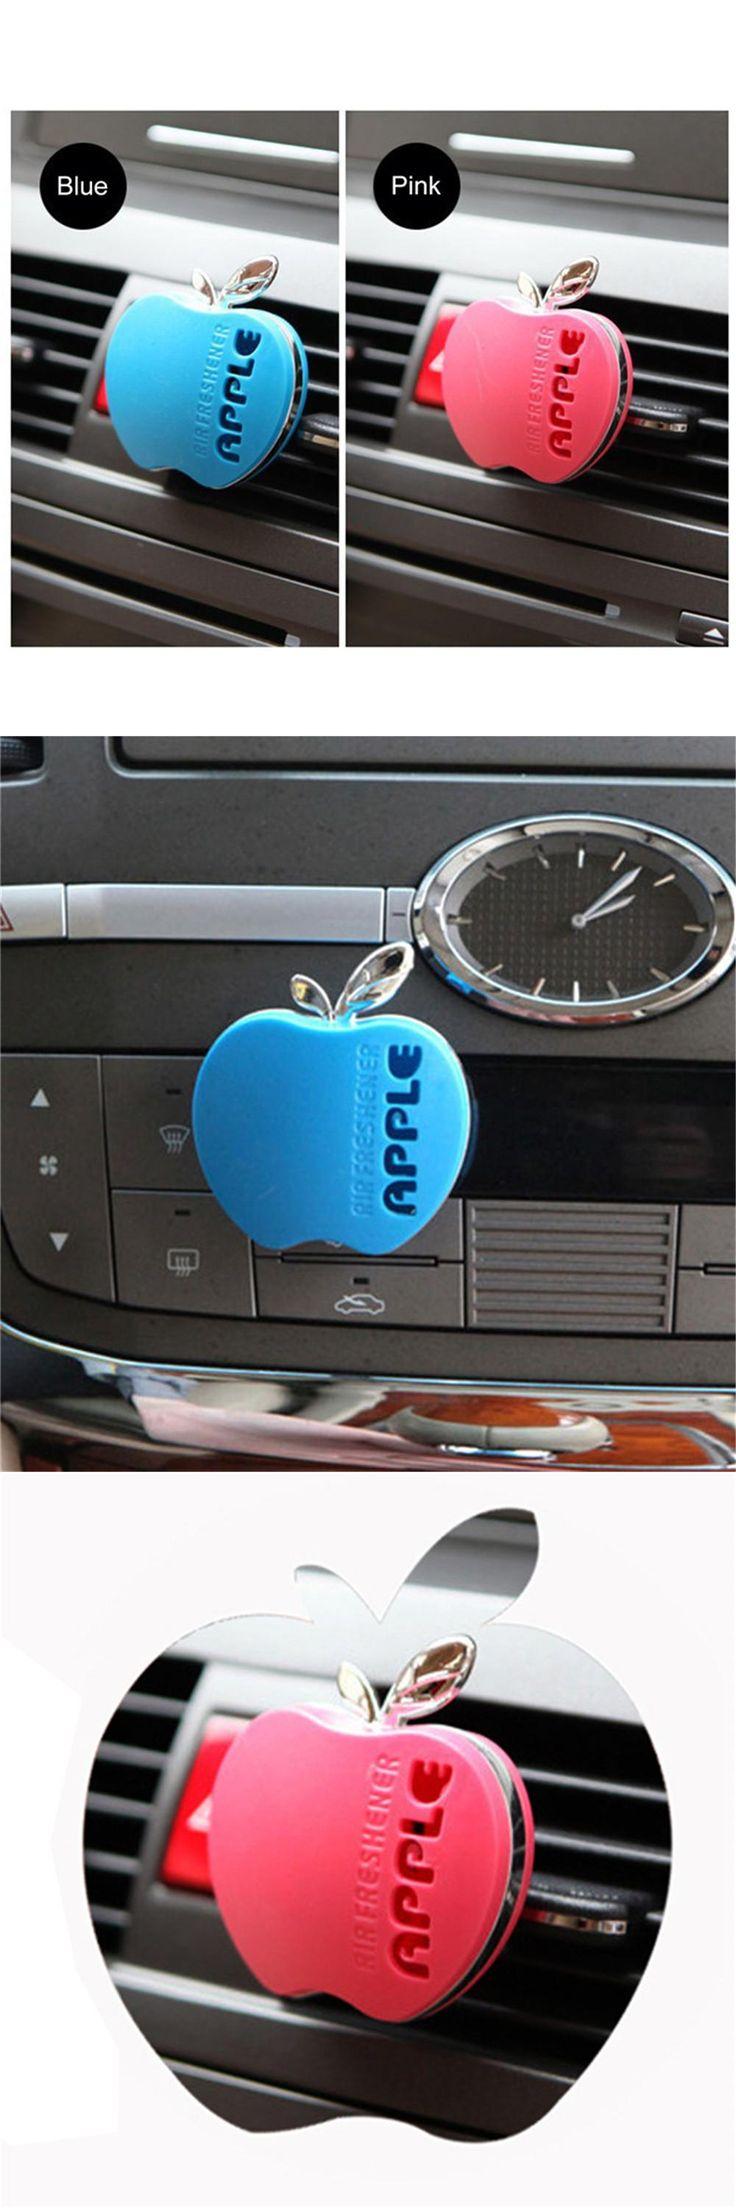 [Visit to Buy] Cute Apple Shape Car Air Conditioning Vent Perfume Air Freshener Cute Apple Car Perfume #Advertisement